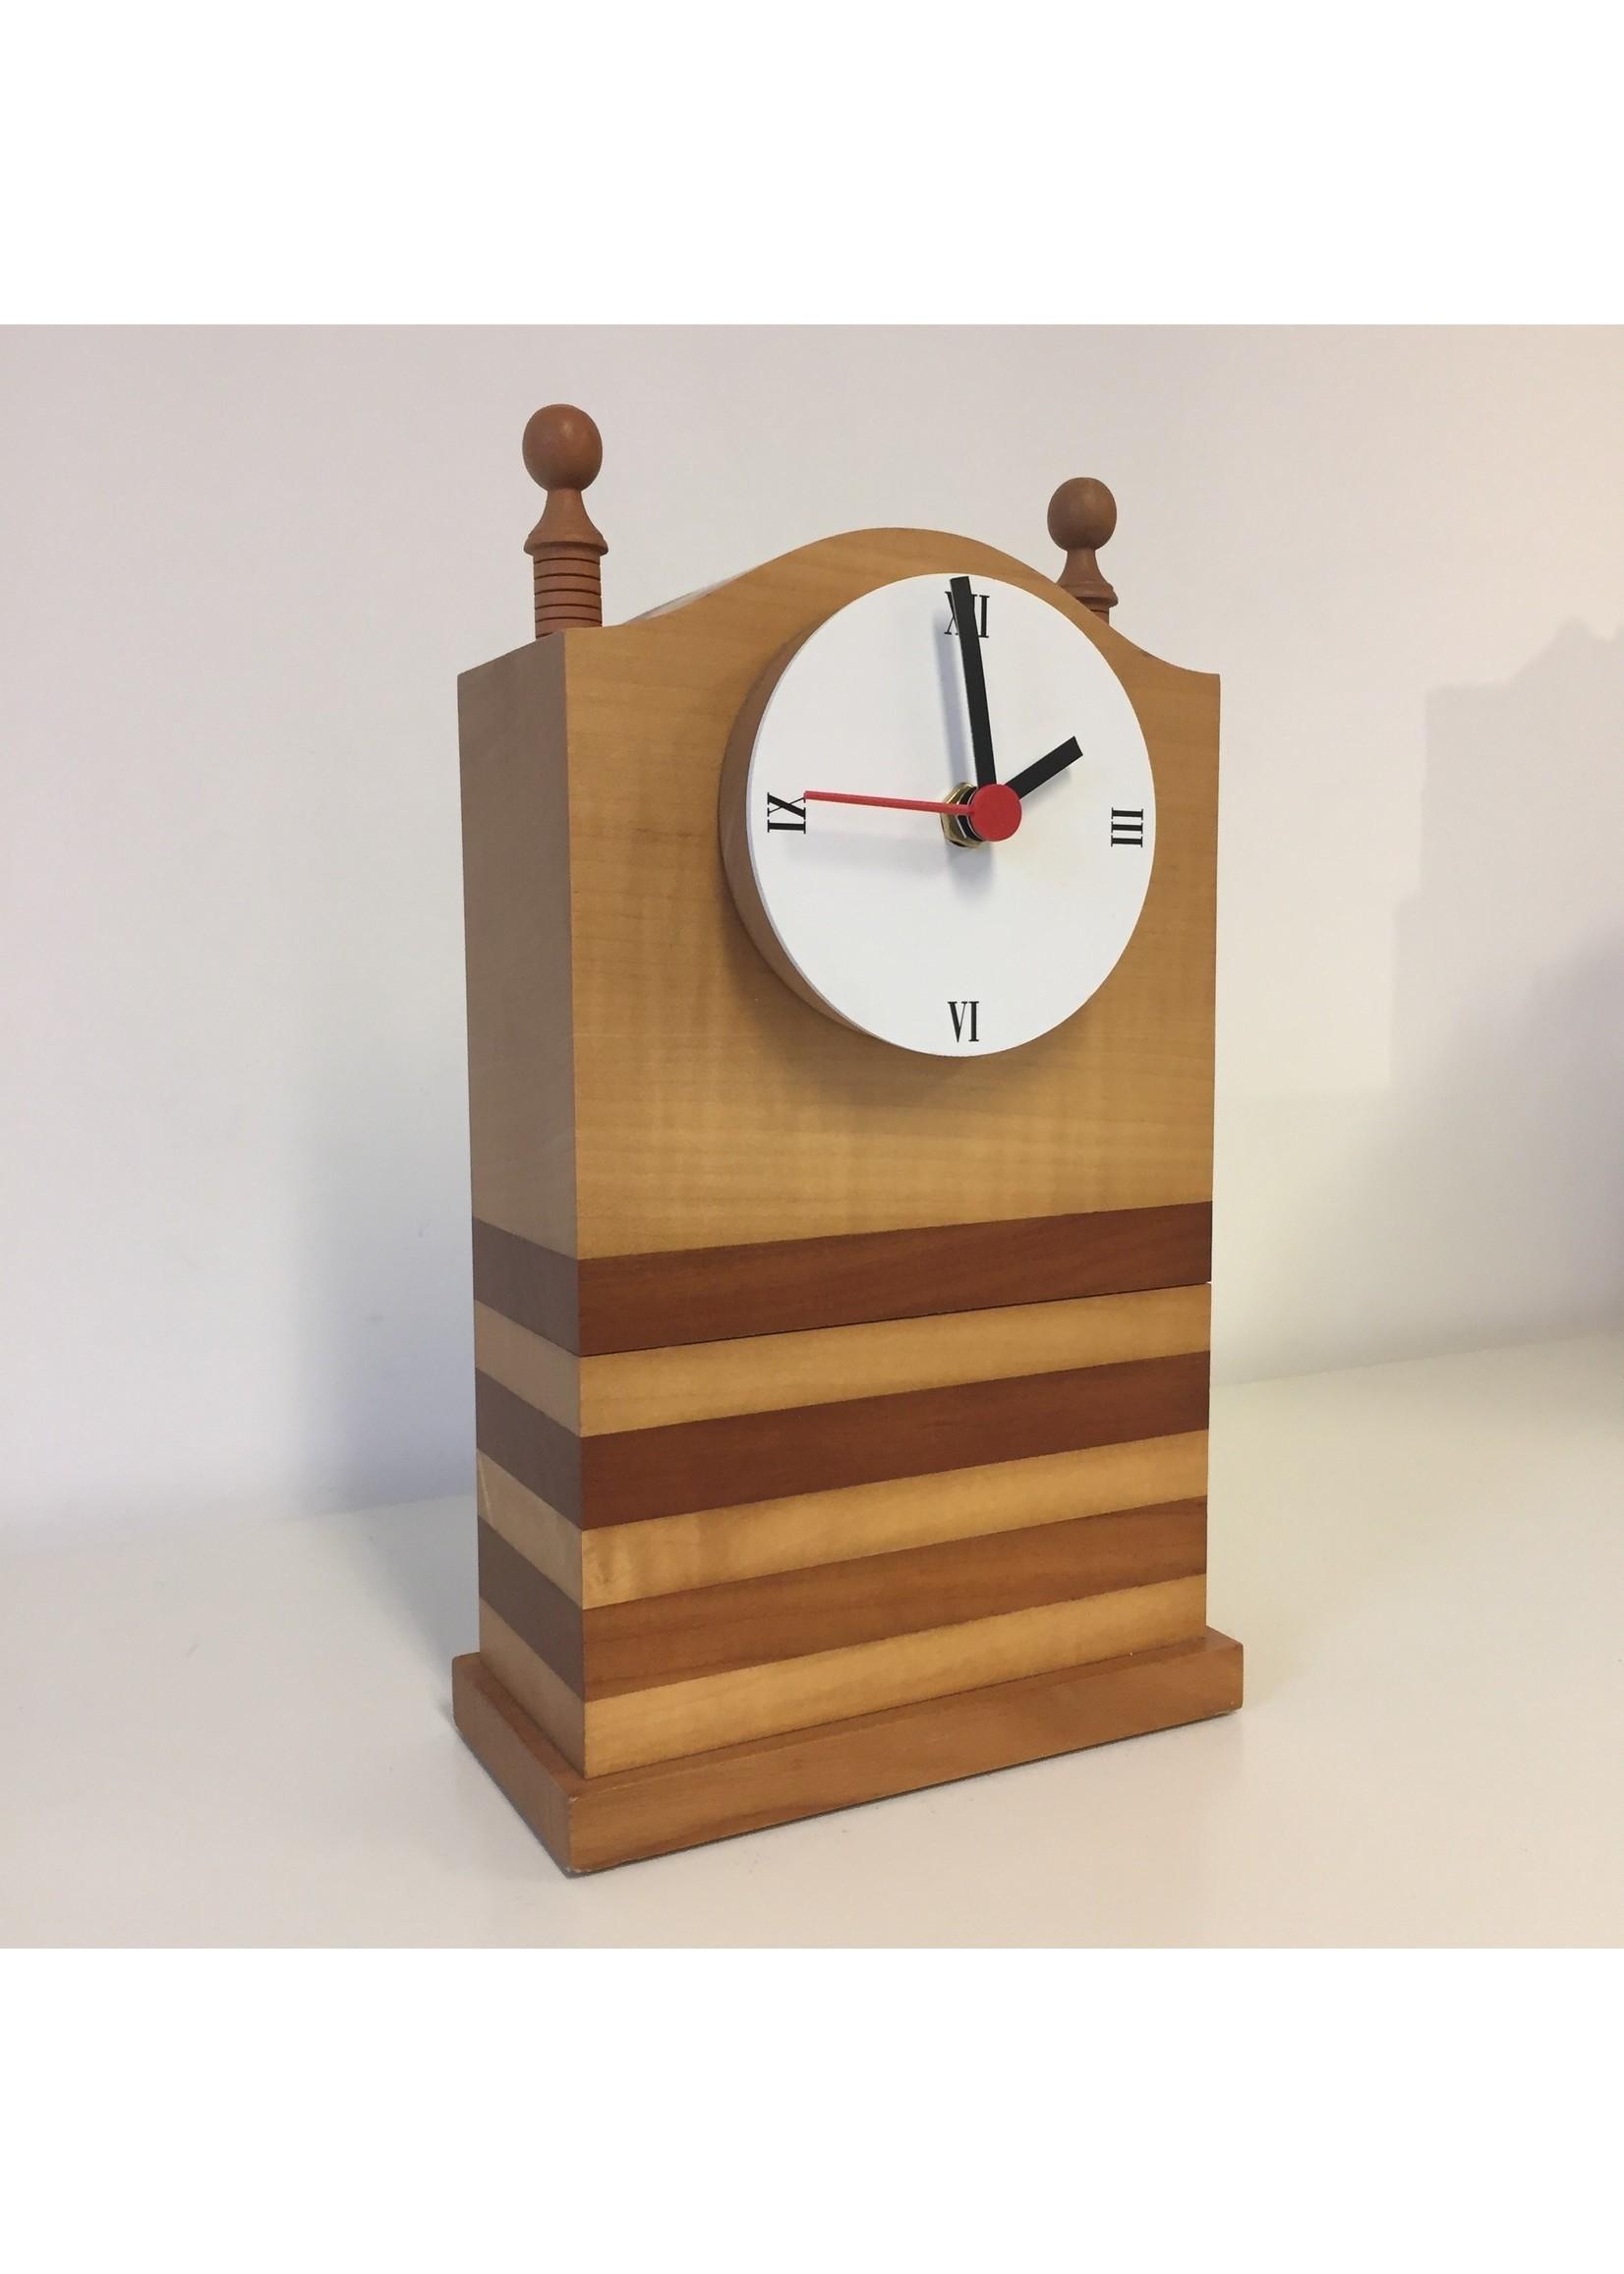 NiceTime Davide Pizzigoni - Pirondini - ART DESIGN  klok